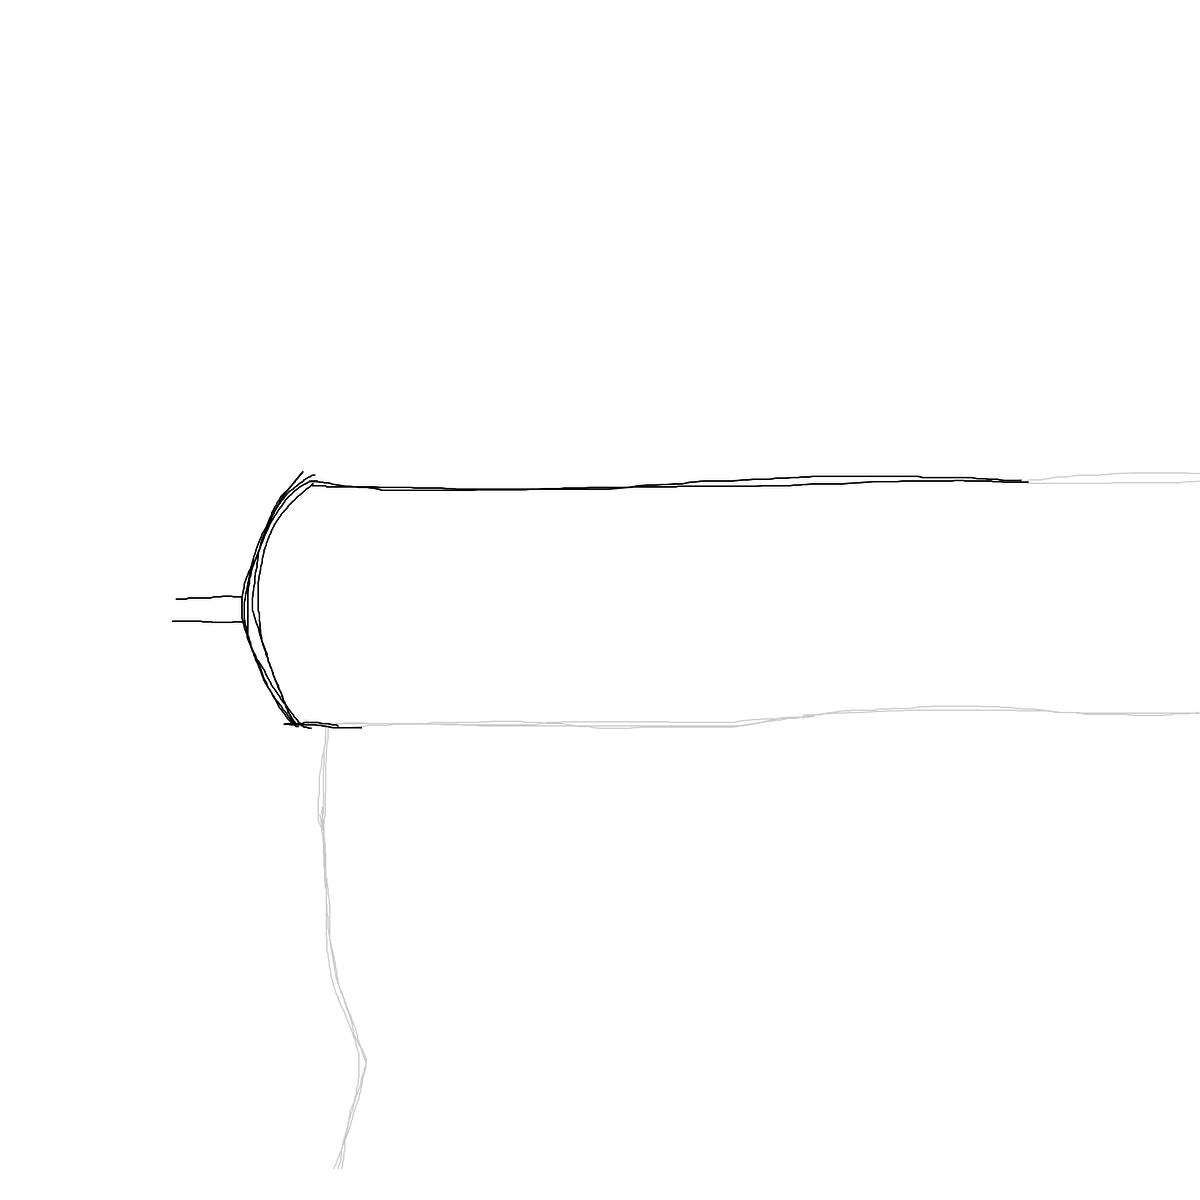 BAAAM drawing#10747 lat:51.0363883972168000lng: -114.0524978637695300